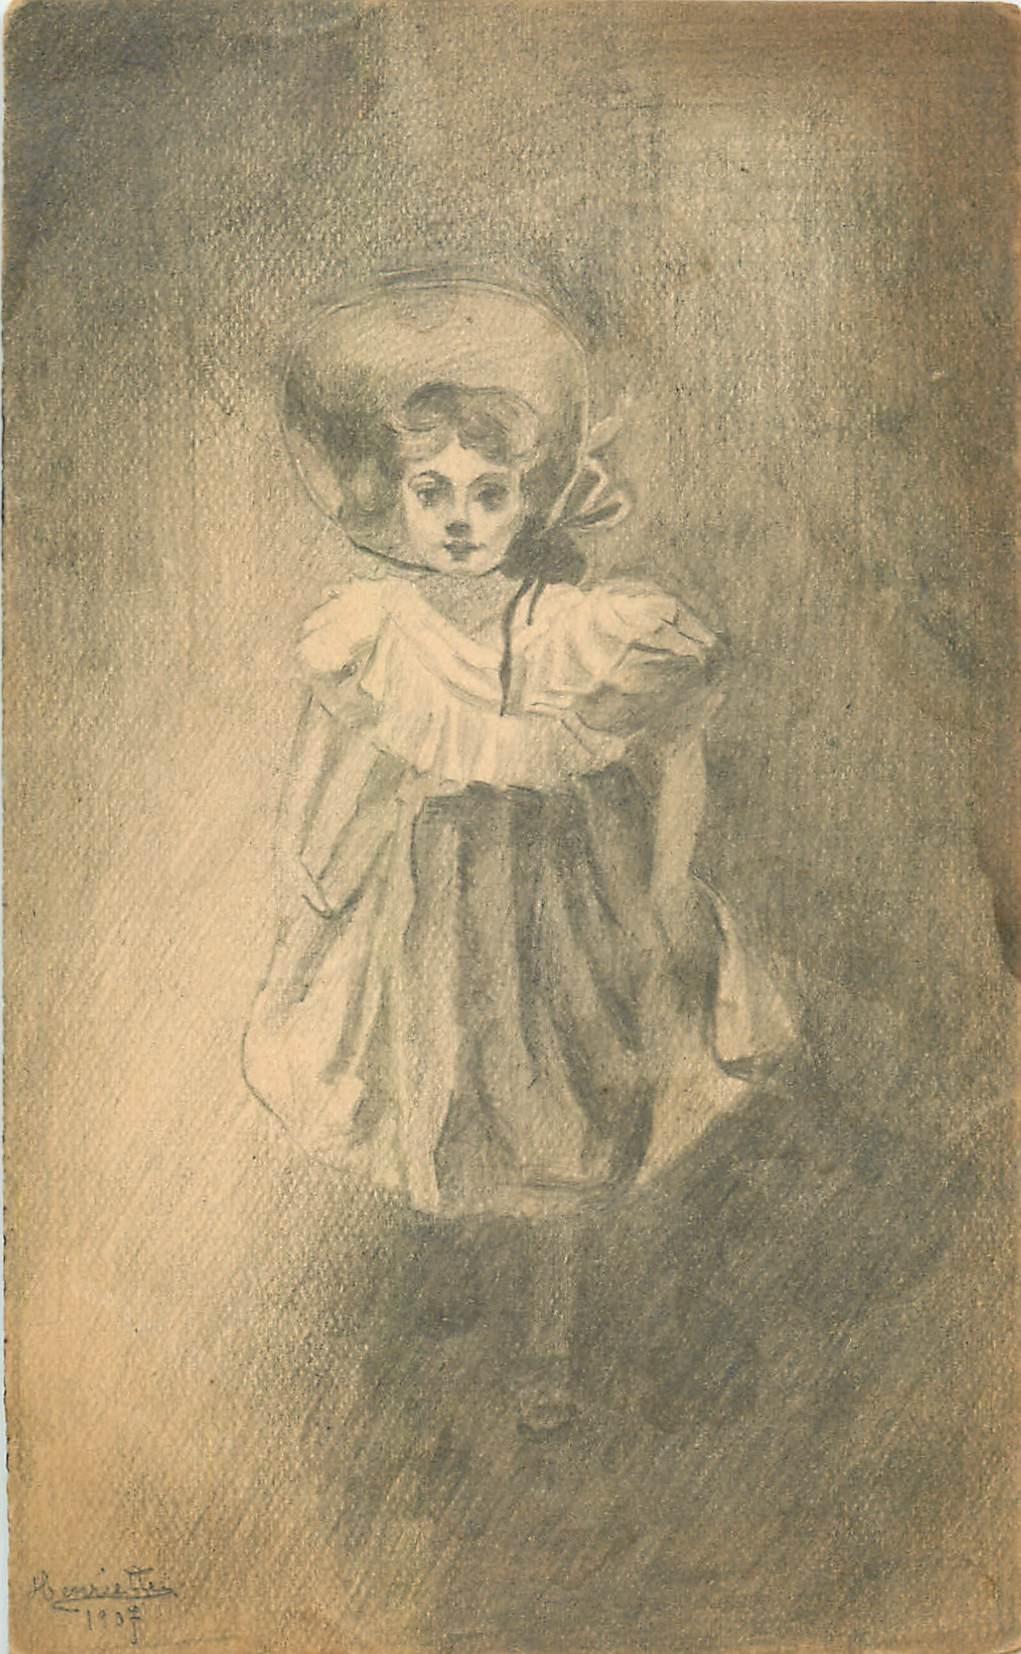 Illustratrice HENRIETTE. Jeune fille canadienne 1907